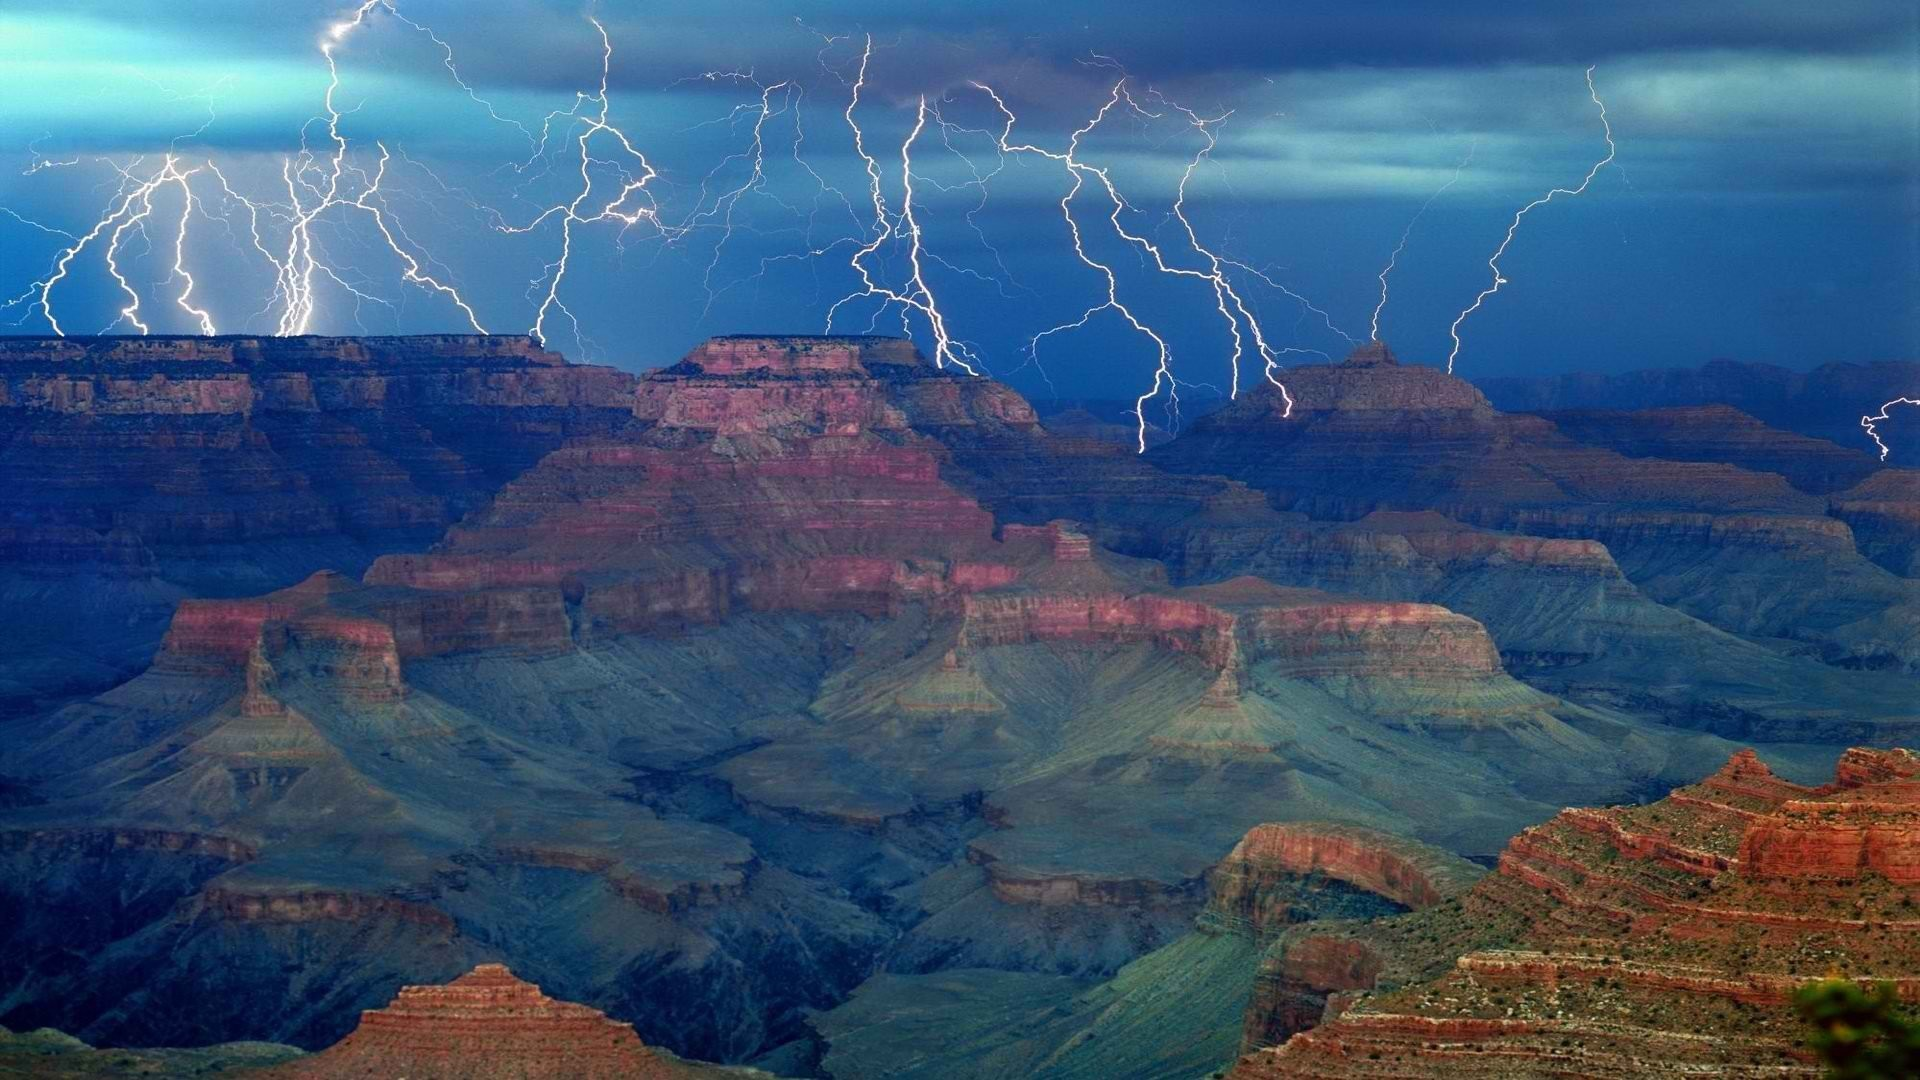 Grand Canyon National Park 555123. SHARE. TAGS: Gallery Cool World Desktop  Backgrounds Landscape Background Alien Planet …